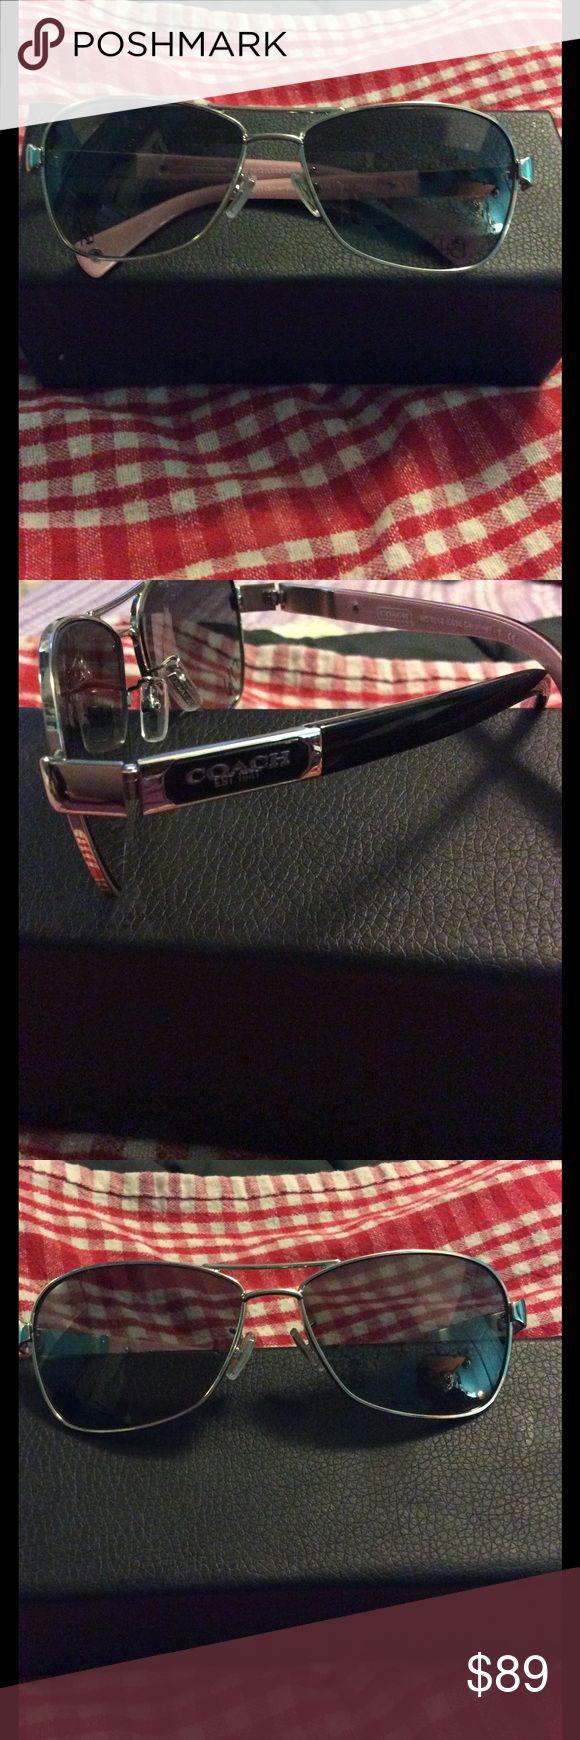 Coach sunglasses Coach sunglasses Caroline silver/black coach Accessories Glasses